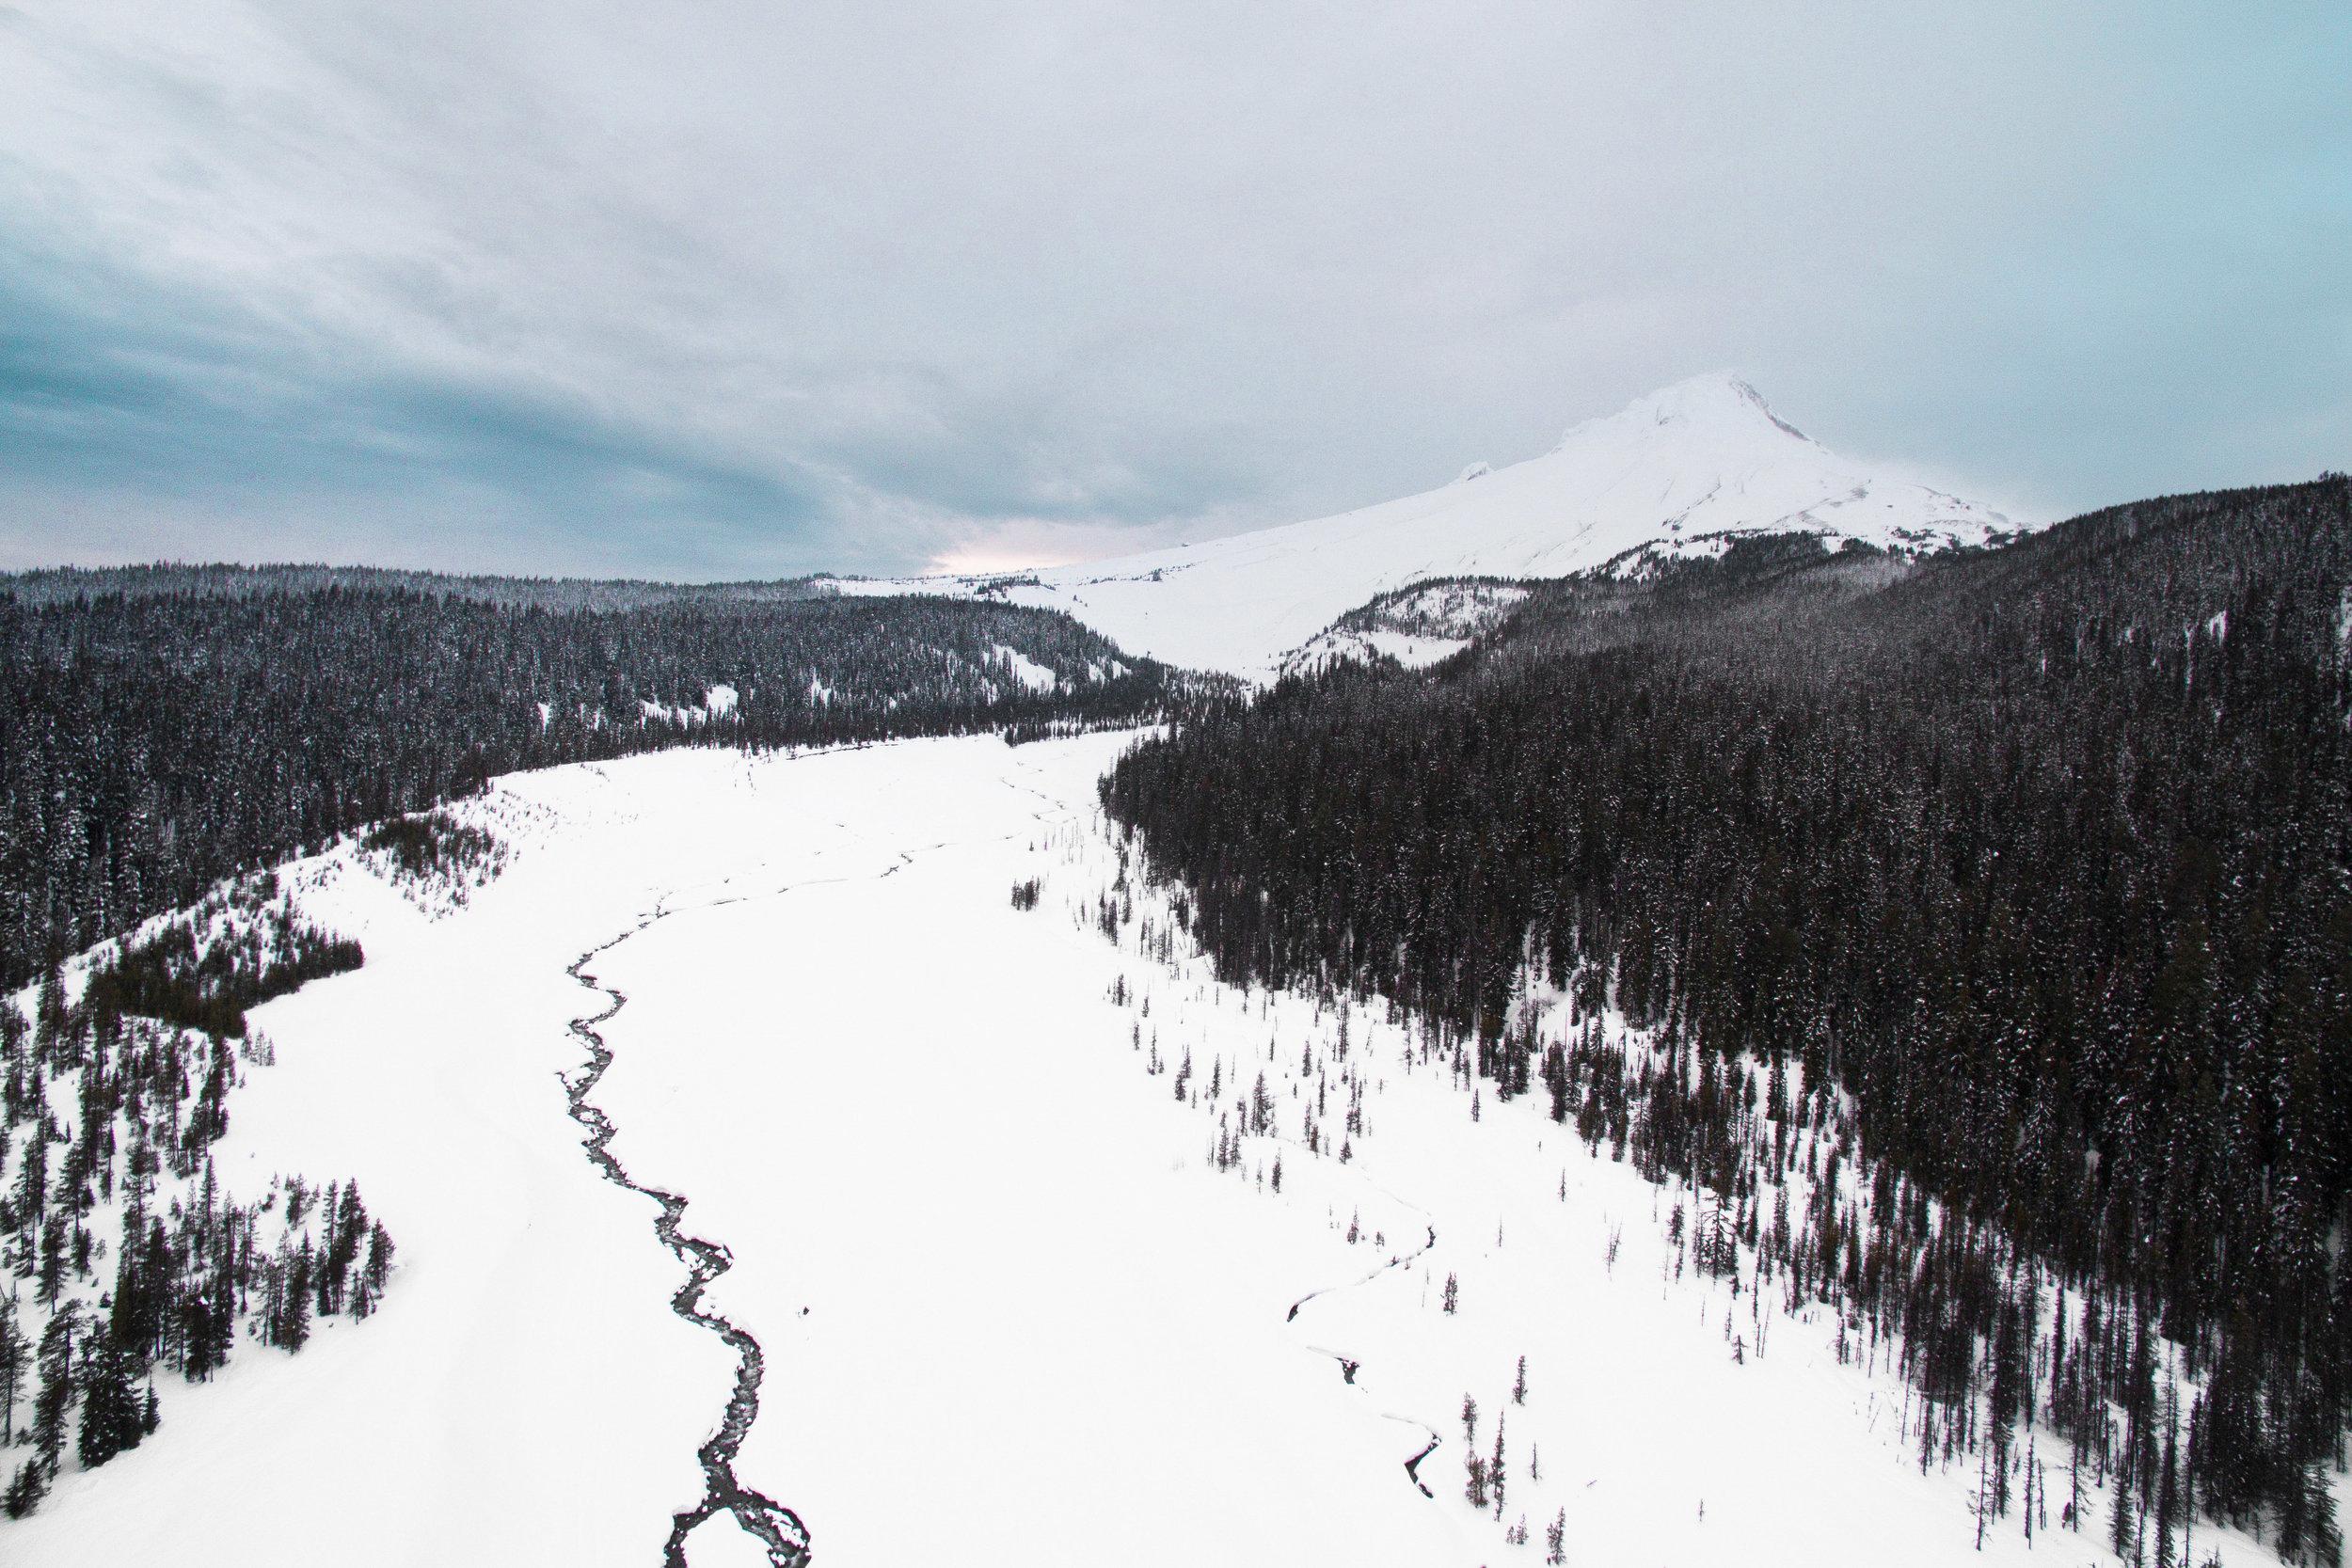 024Travel_Adventure_Photography_Outlive_Creative_Oregon_Mount_Hood.jpg